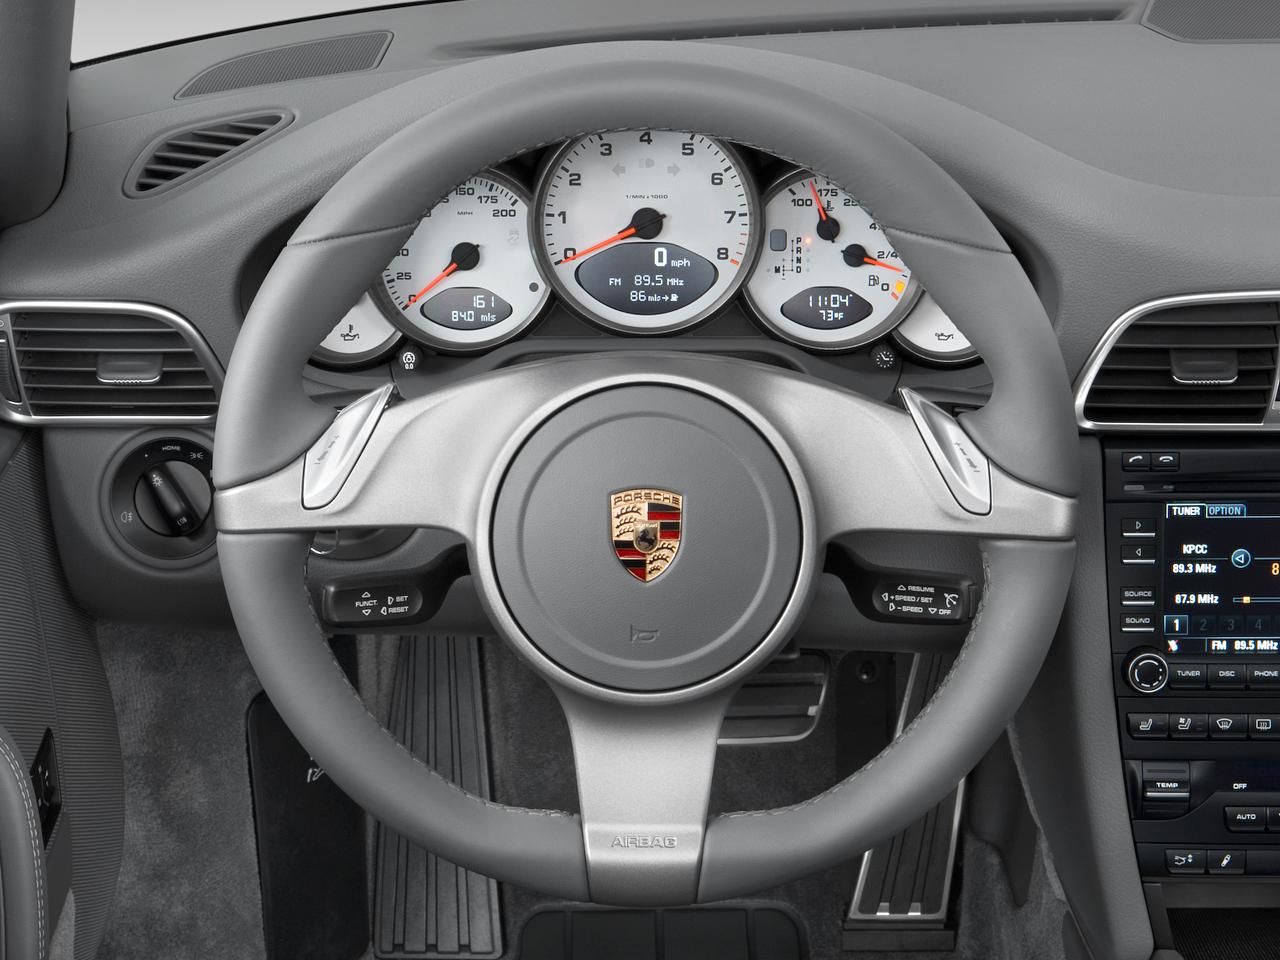 2009 Porsche 911 Carrera S Porshe Sport Coupe Review